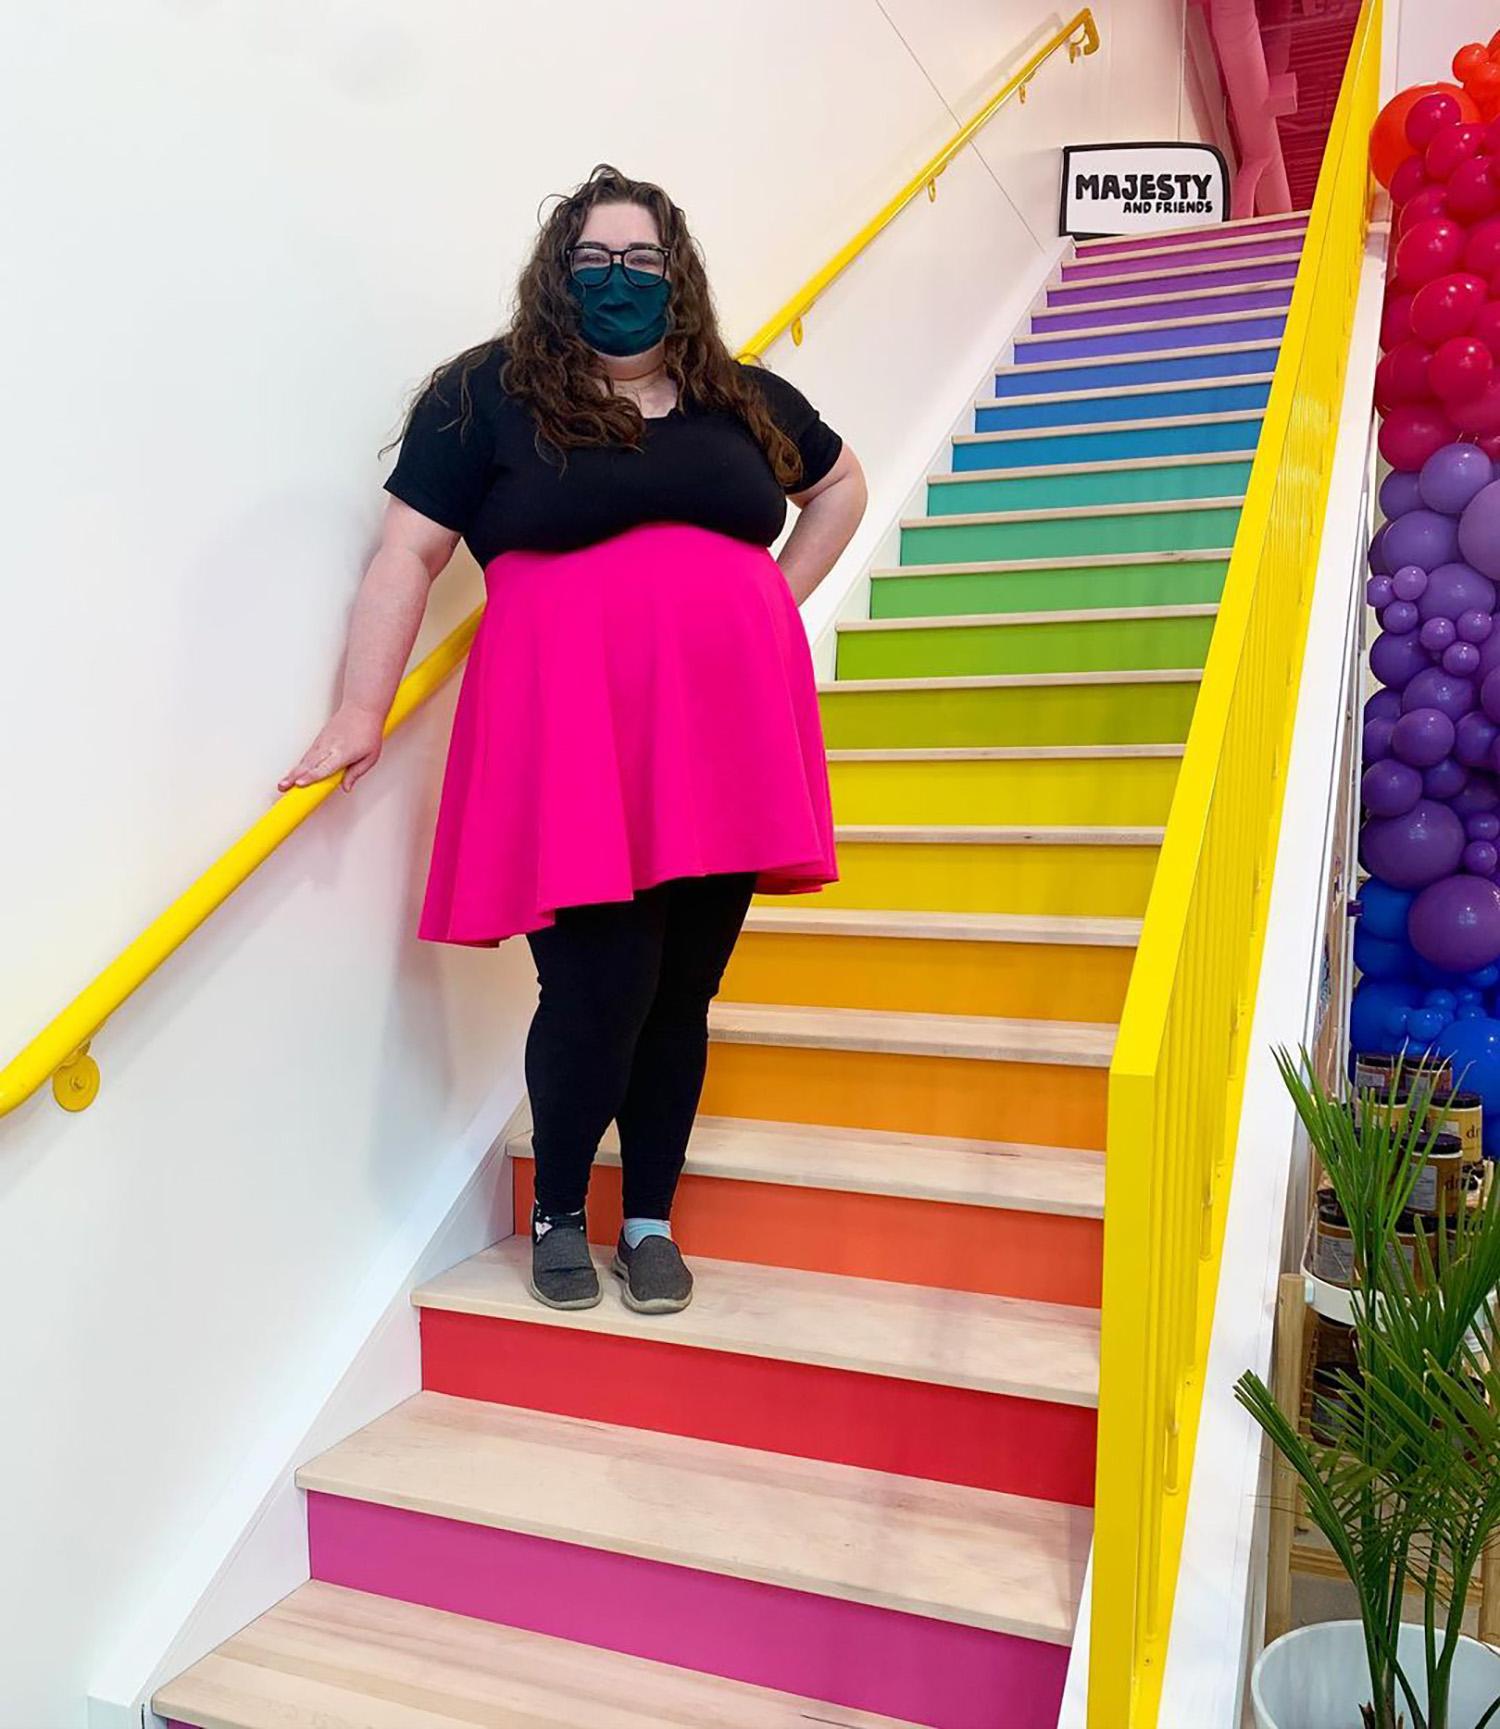 Instagrammable Walls of Edmonton - Explore Edmonton - Murals - Walls - Majesy and Friends Rainbow Stairs